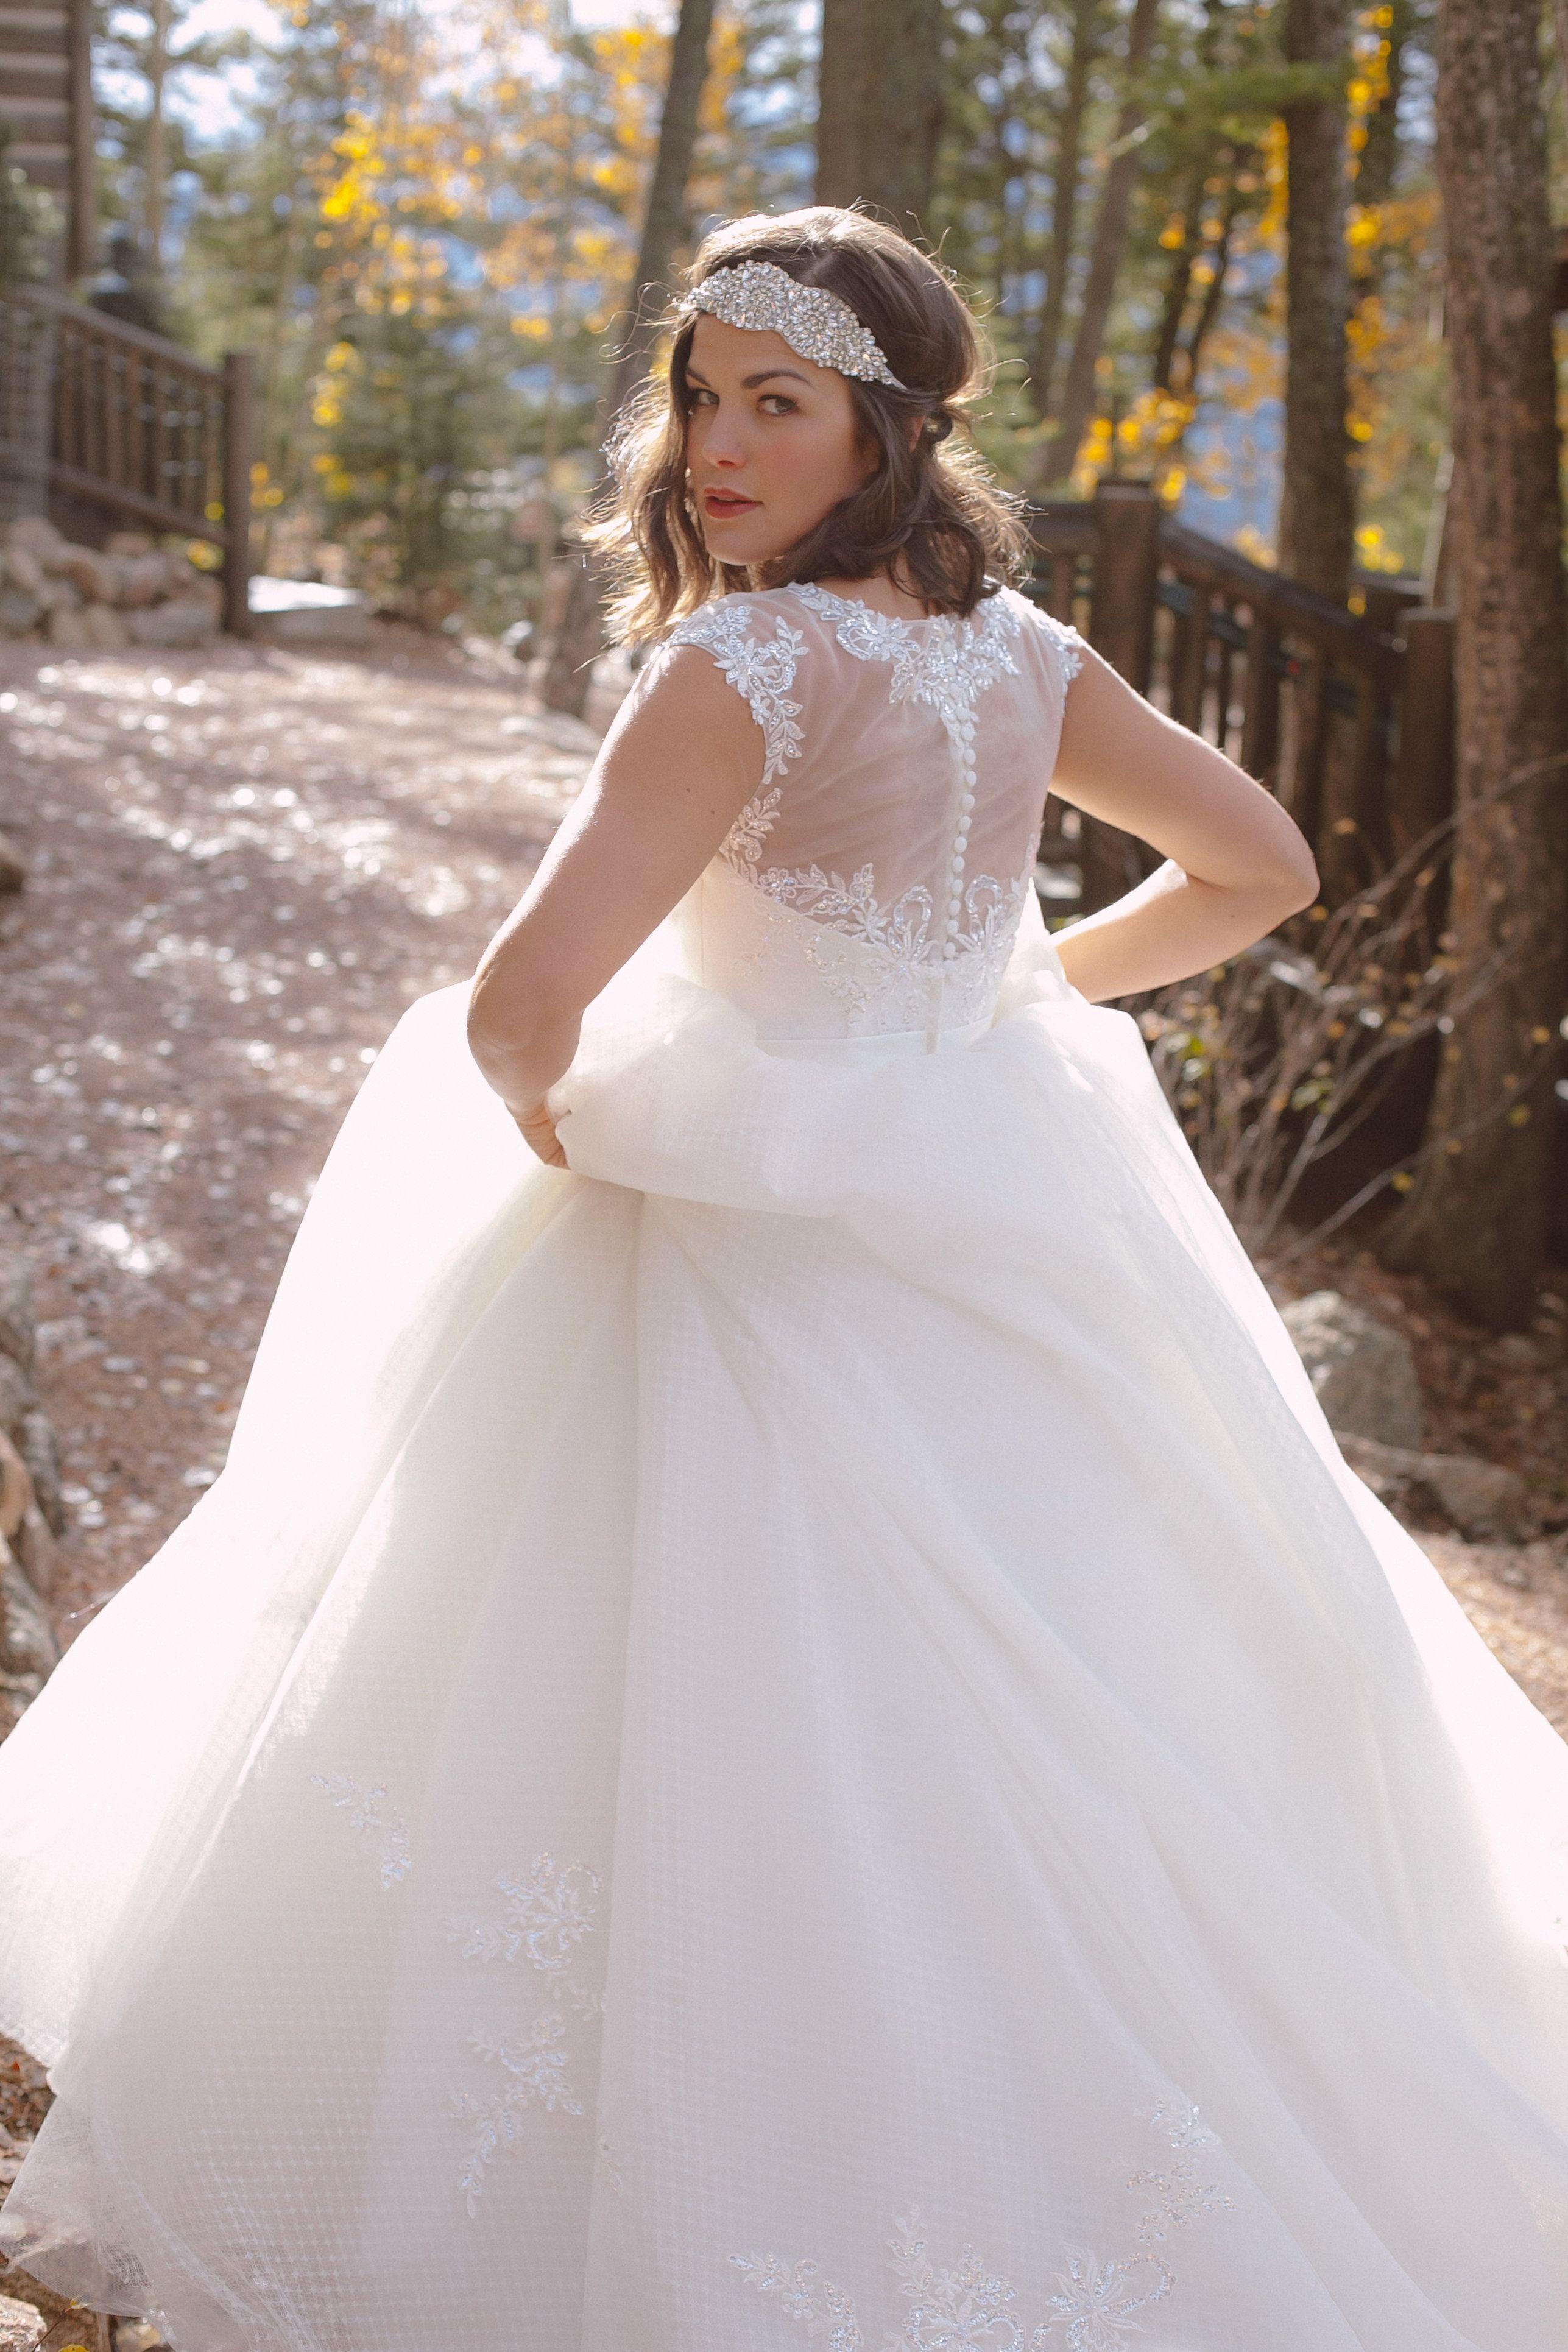 Wedding dresses stores  Divina Wedding Dresses at The Broadmoor Cloud Camp  Divina Wedding